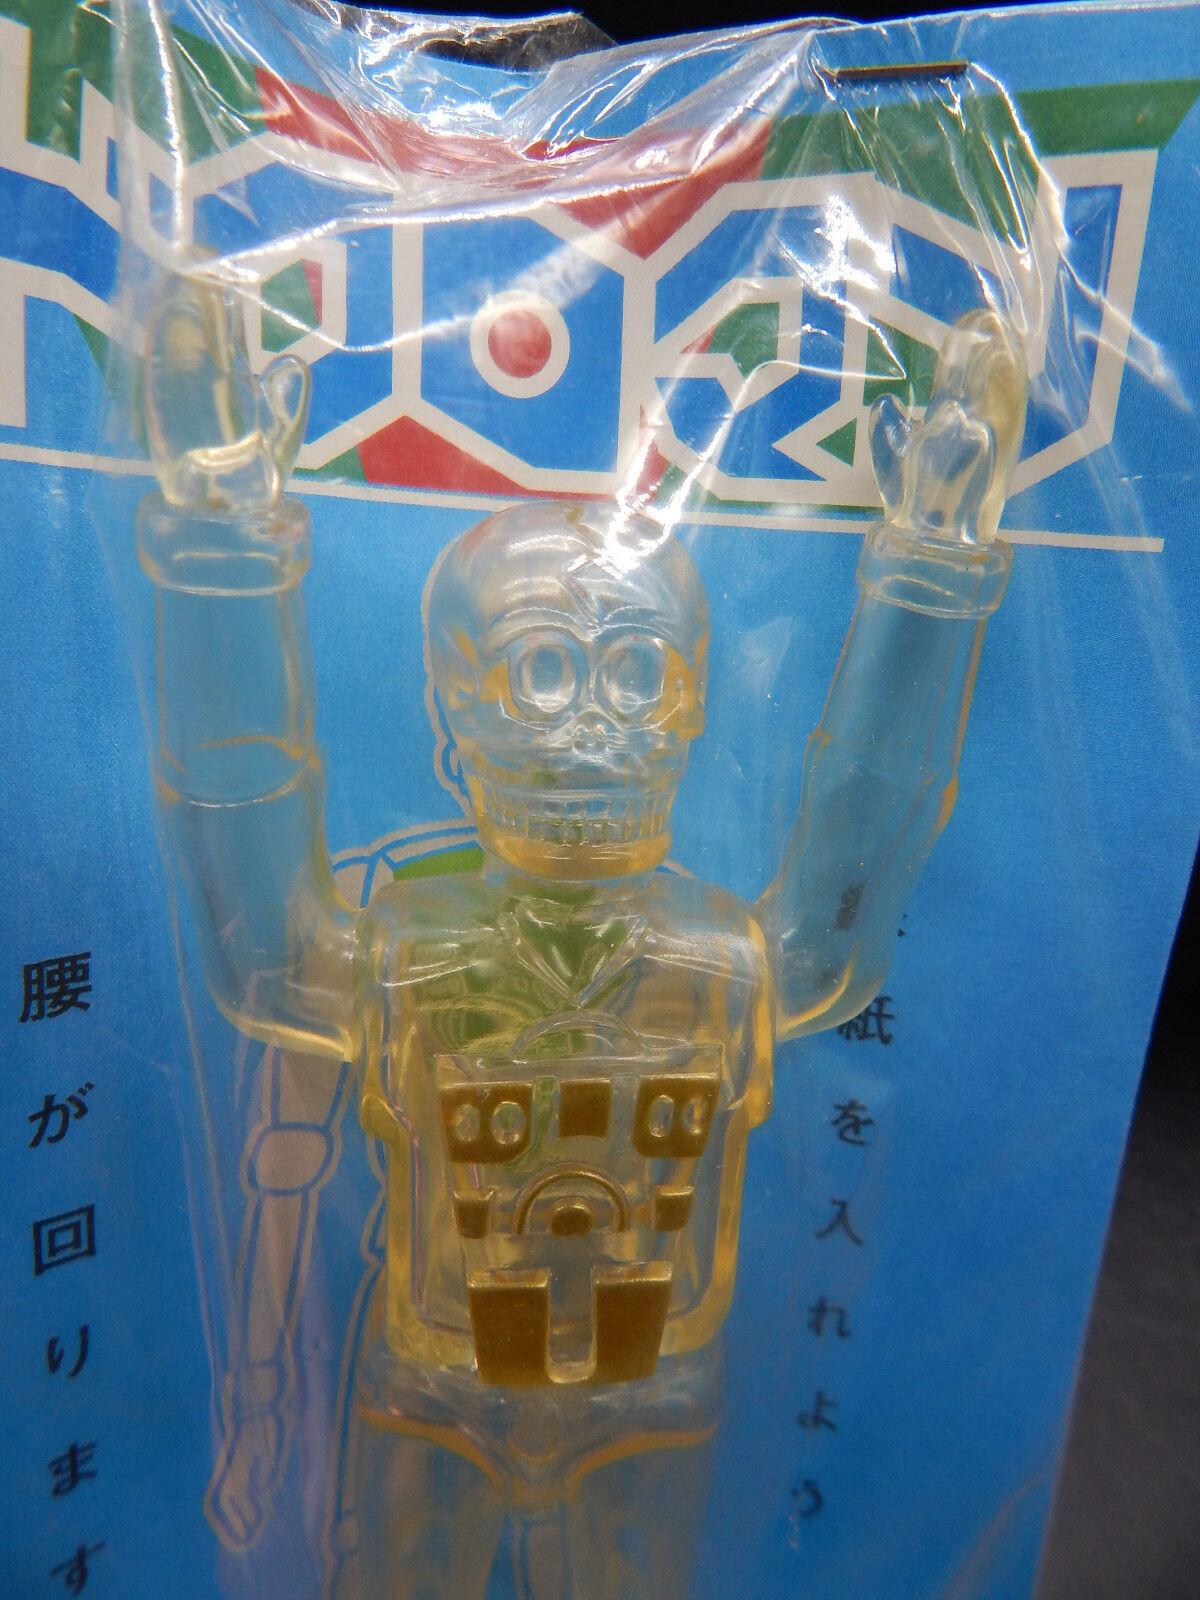 RARE Gargamel toy DOKUROMAN Japanese sofubi Microman type figure SEALED vinyl